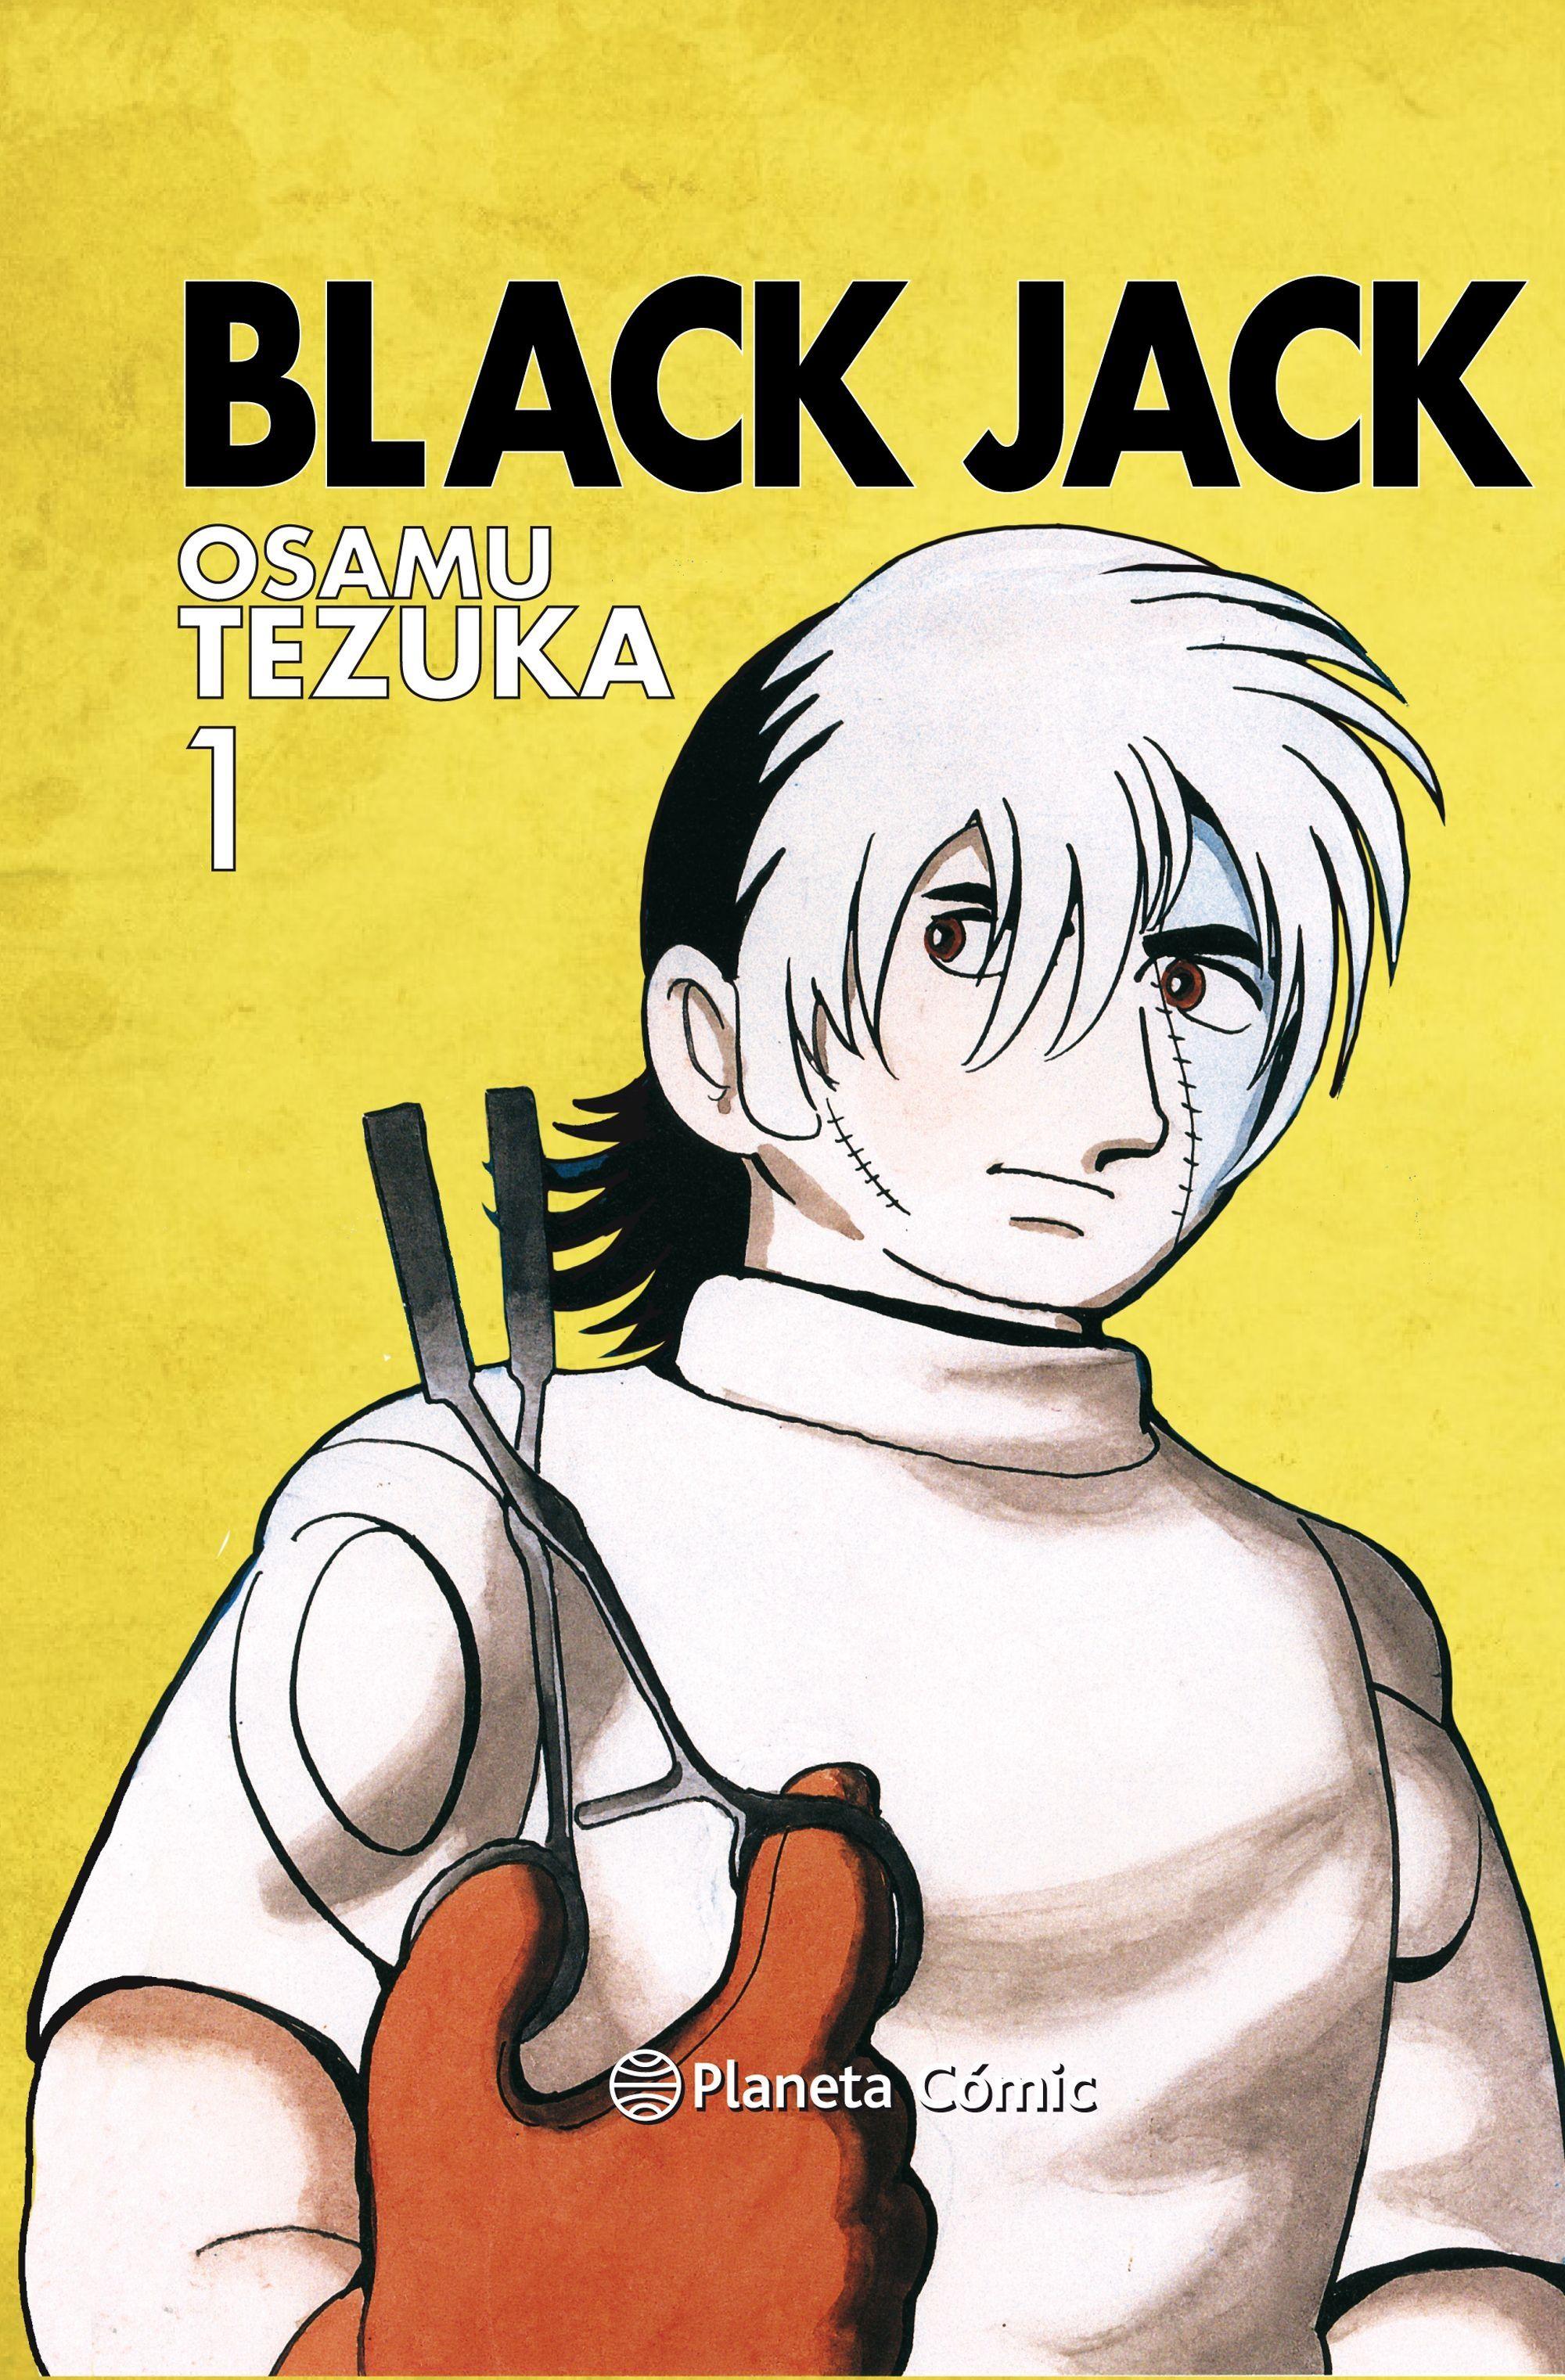 Black Jack nº 01/08 Osamu Tezuka Número de páginas 632